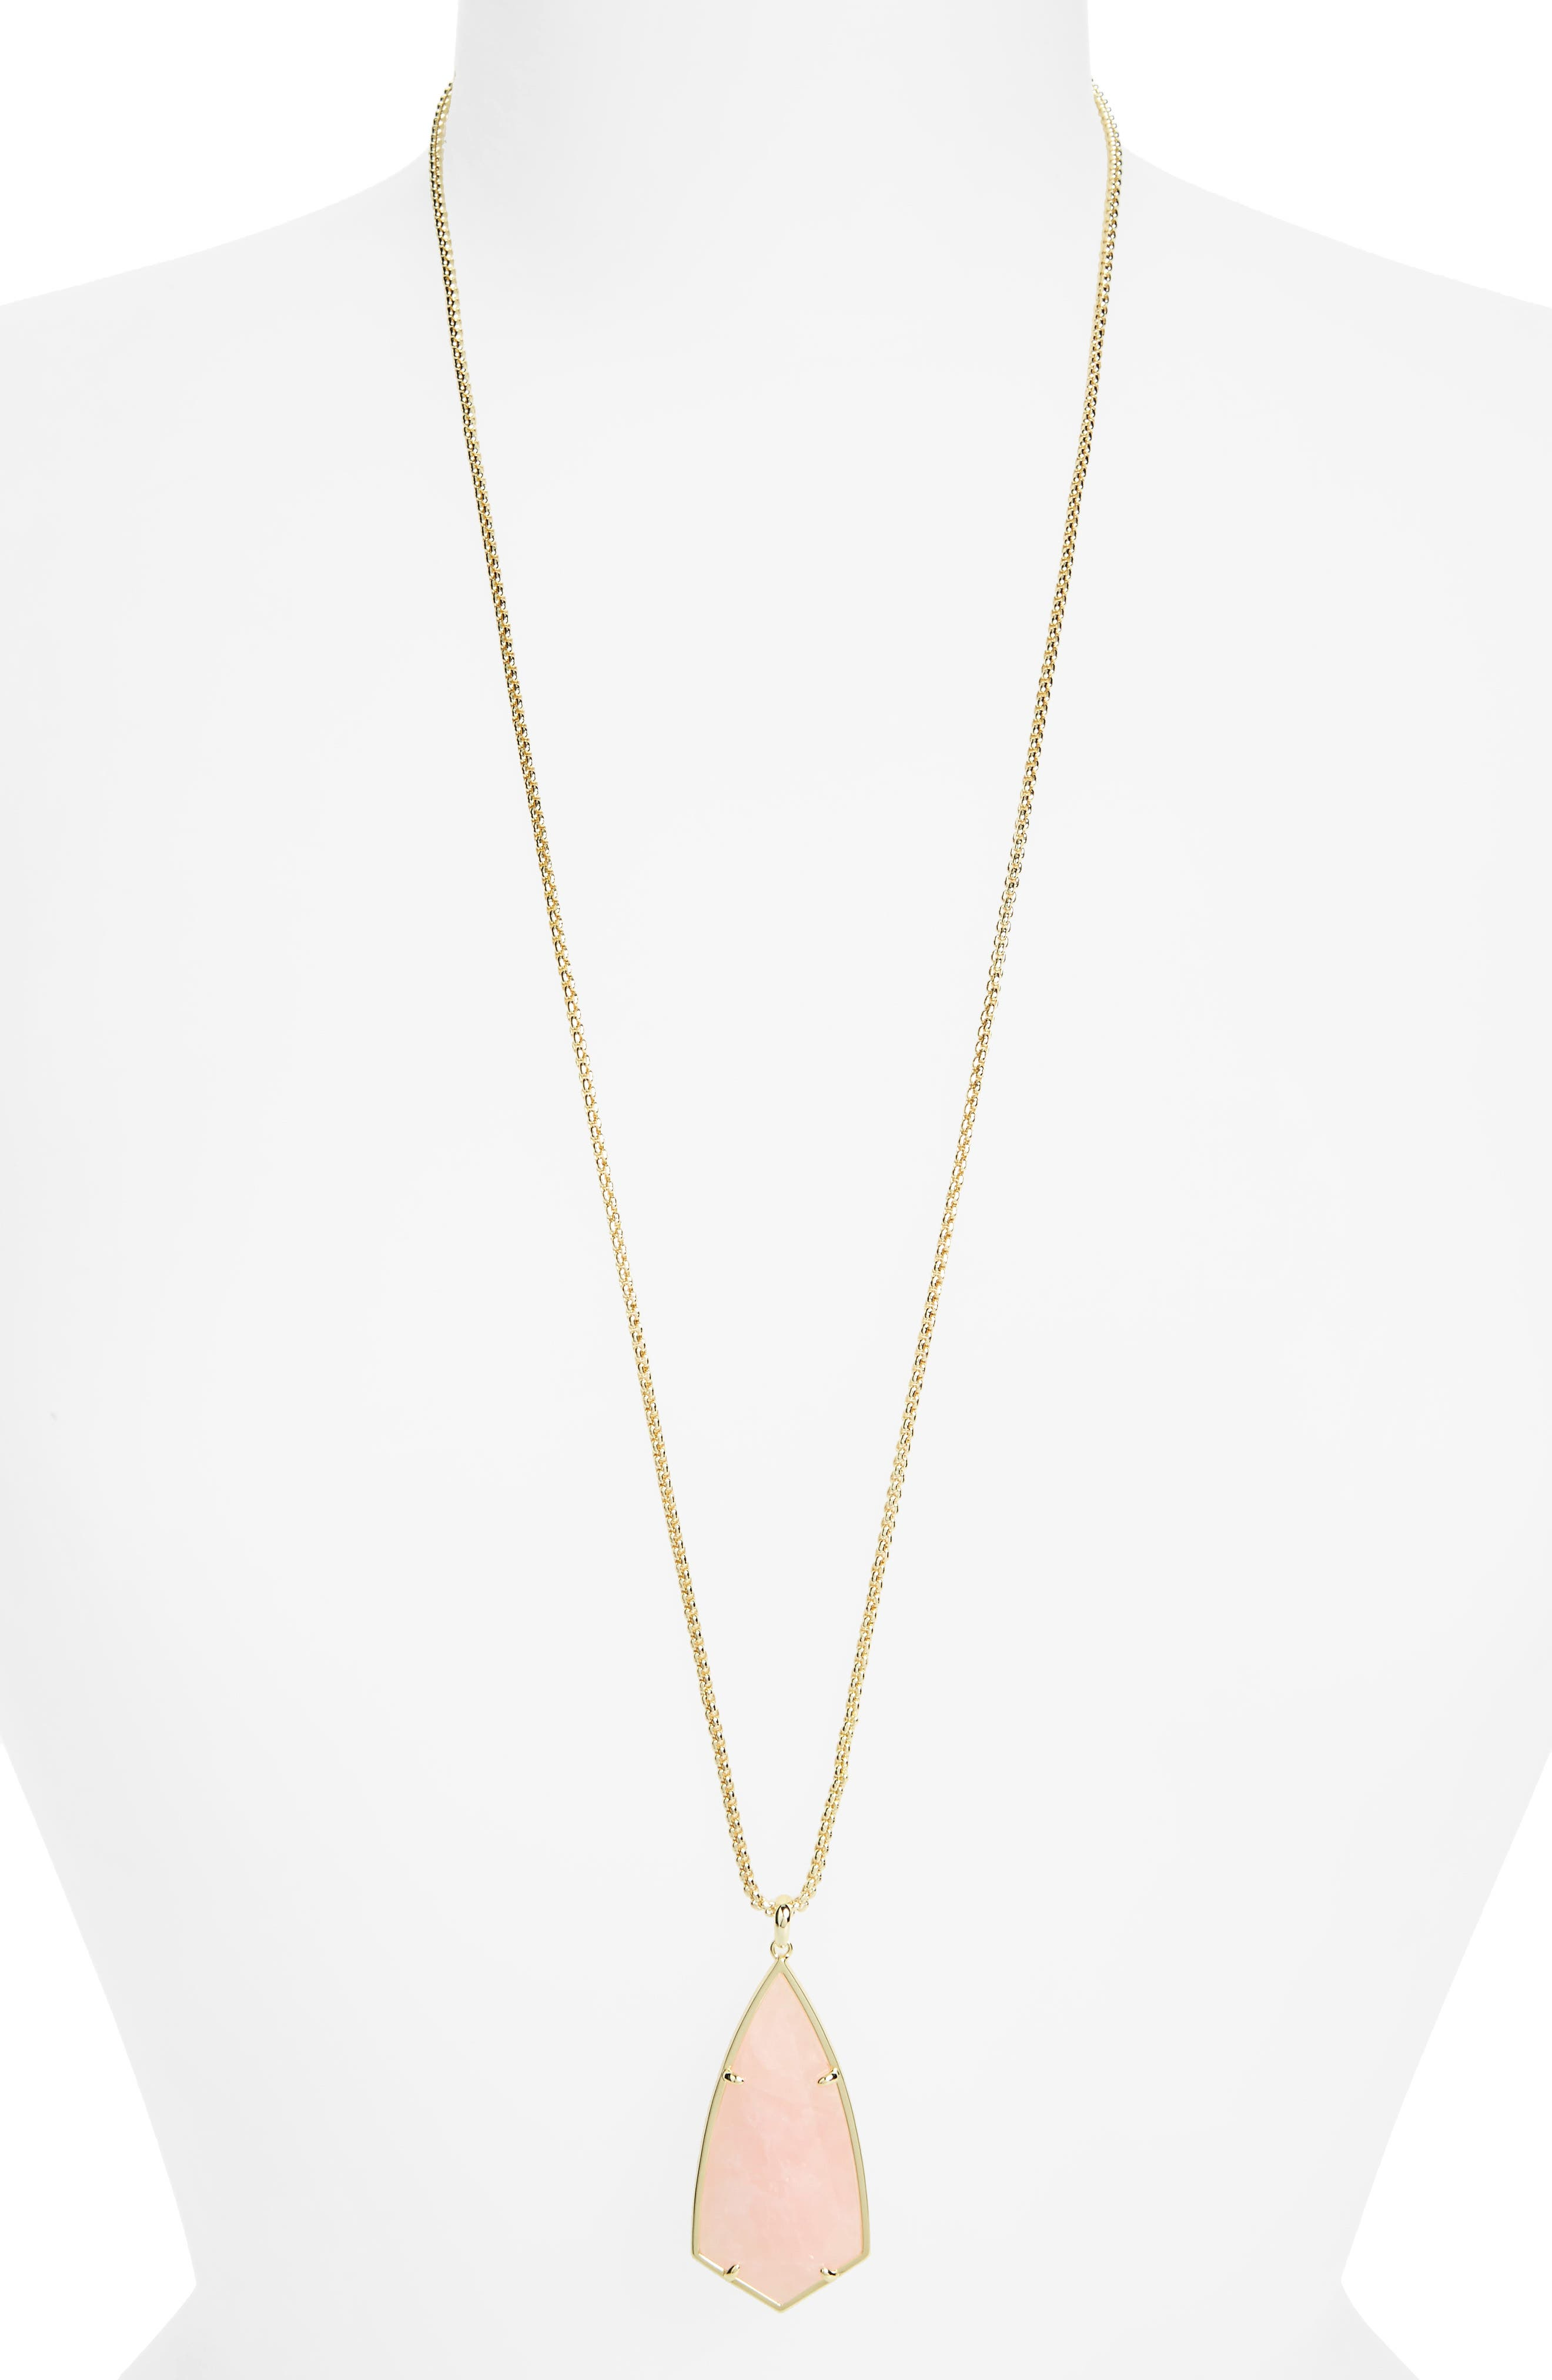 Kendra Scott Carole Long Semiprecious Stone Pendant Necklace